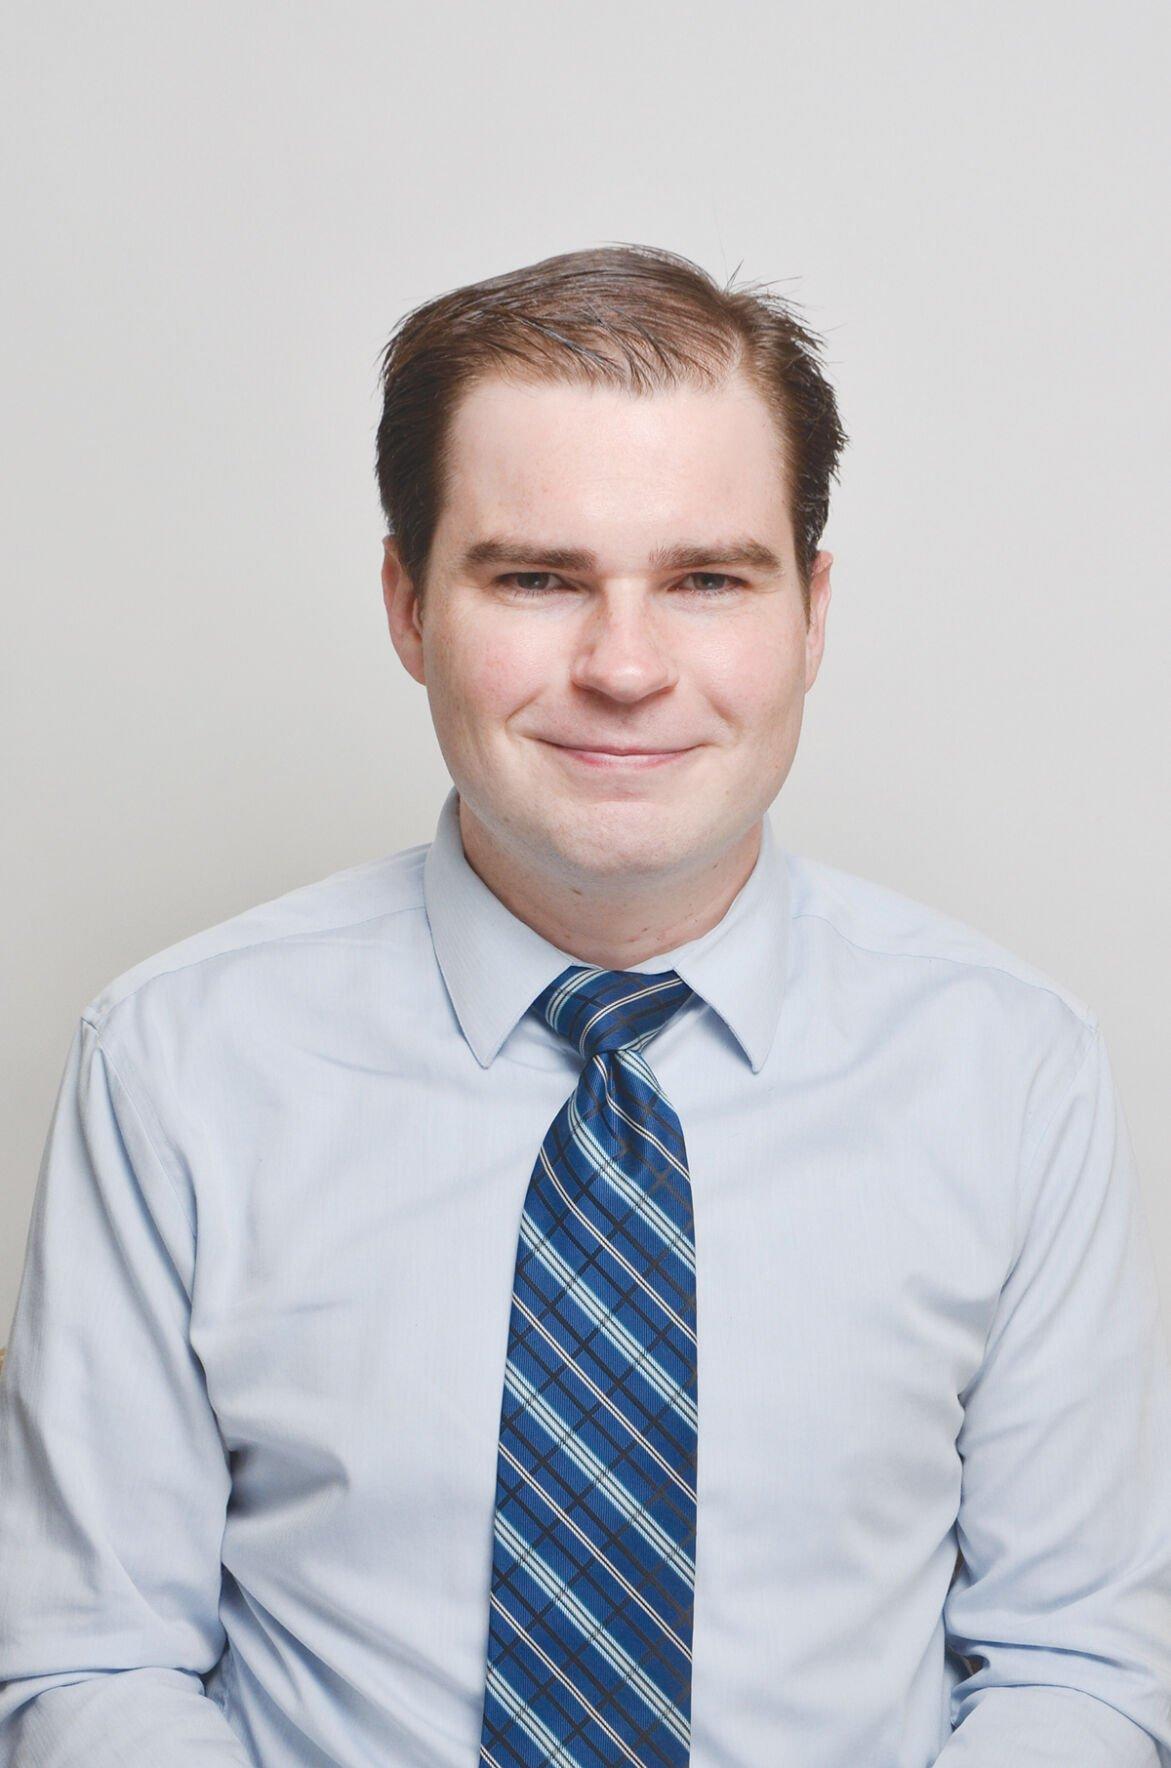 Dr. Peter Ireland